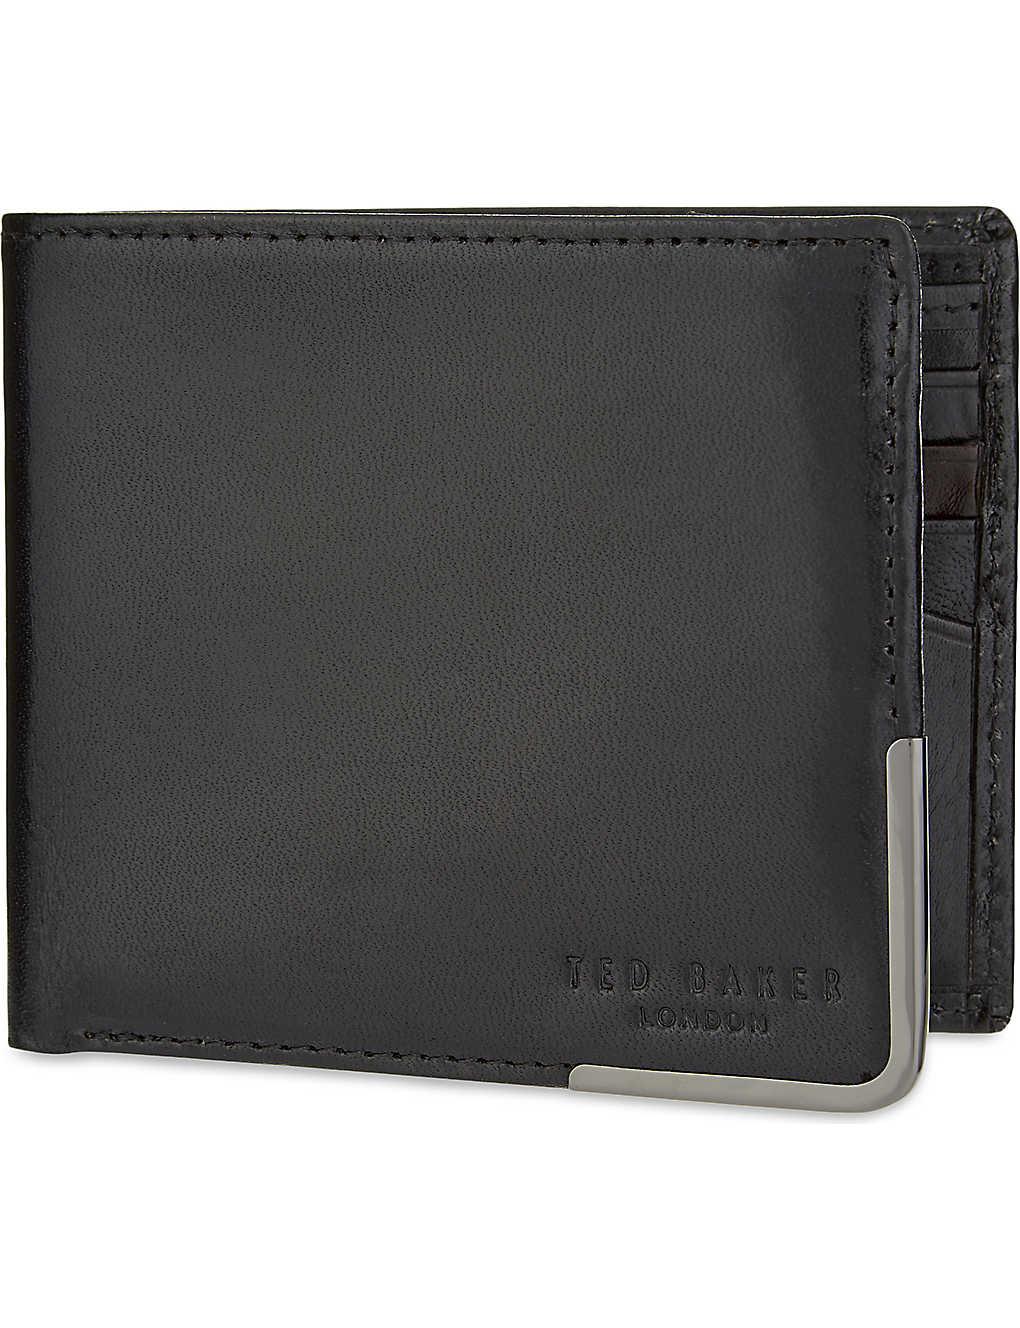 51ba89ac1f TED BAKER - Breeze leather wallet   Selfridges.com